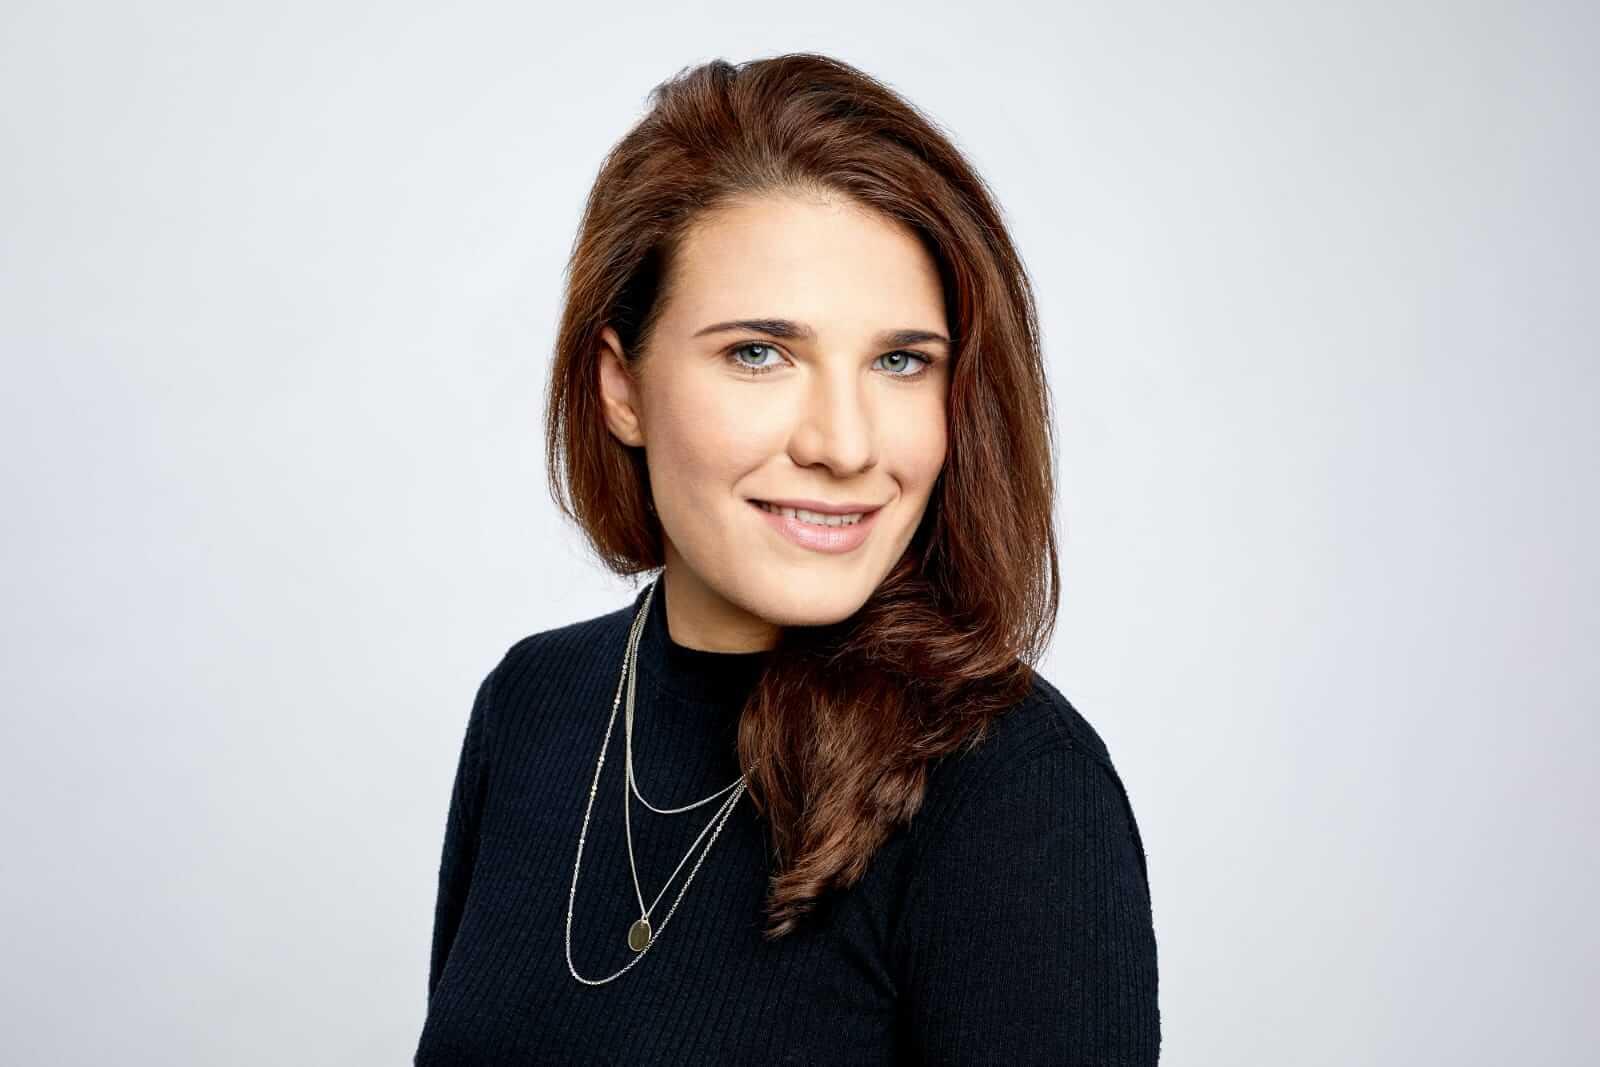 Aneta Roslon